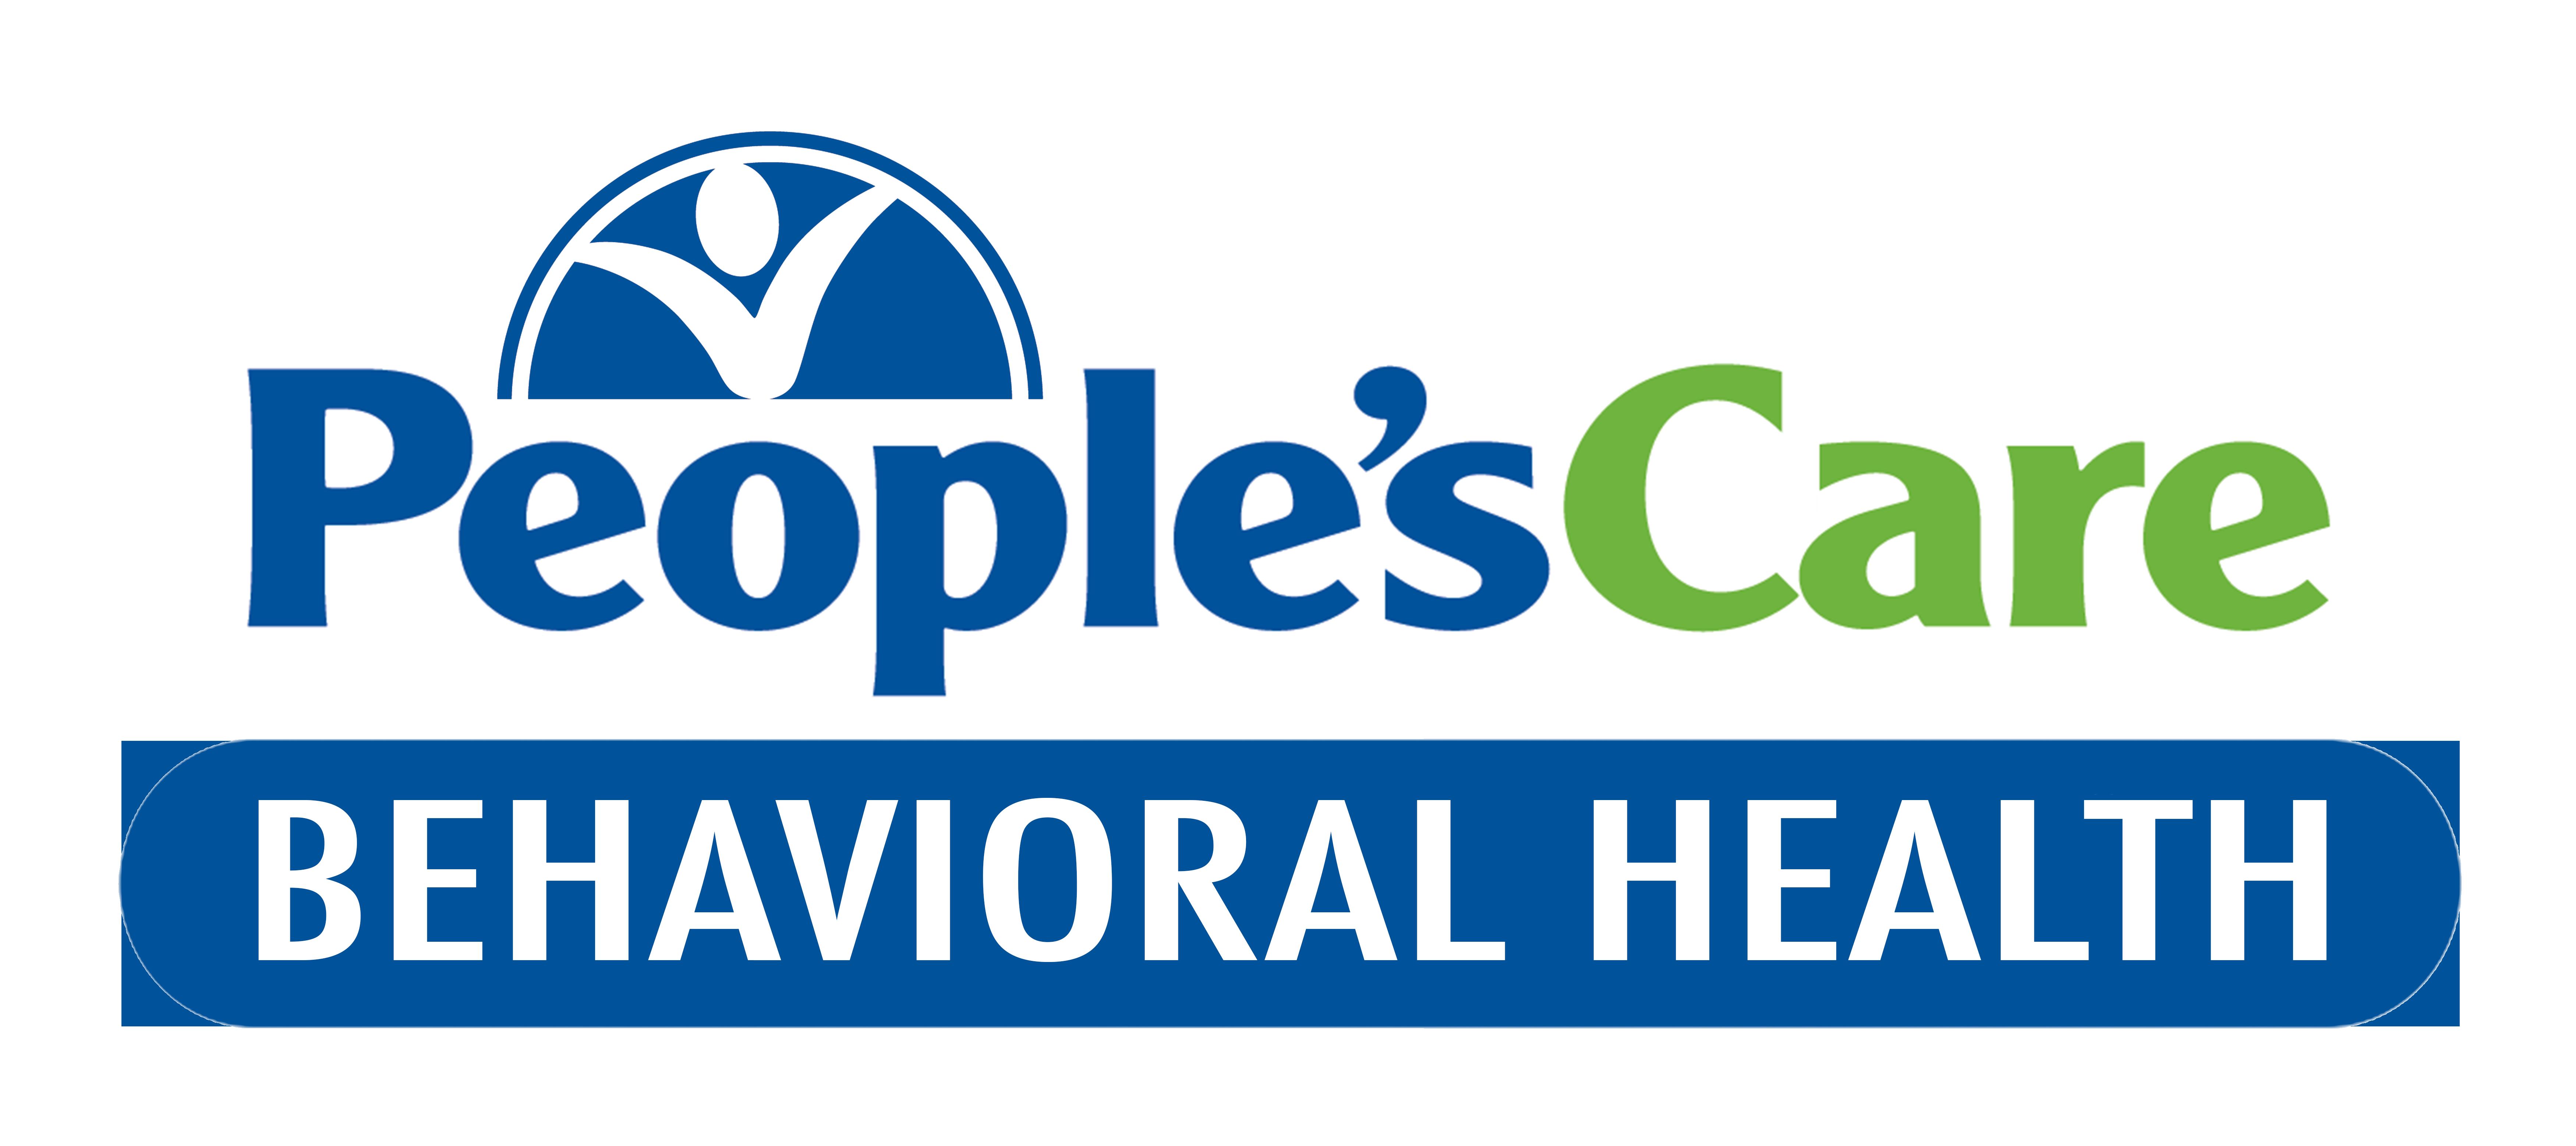 People's Care Behavioral Health Logo